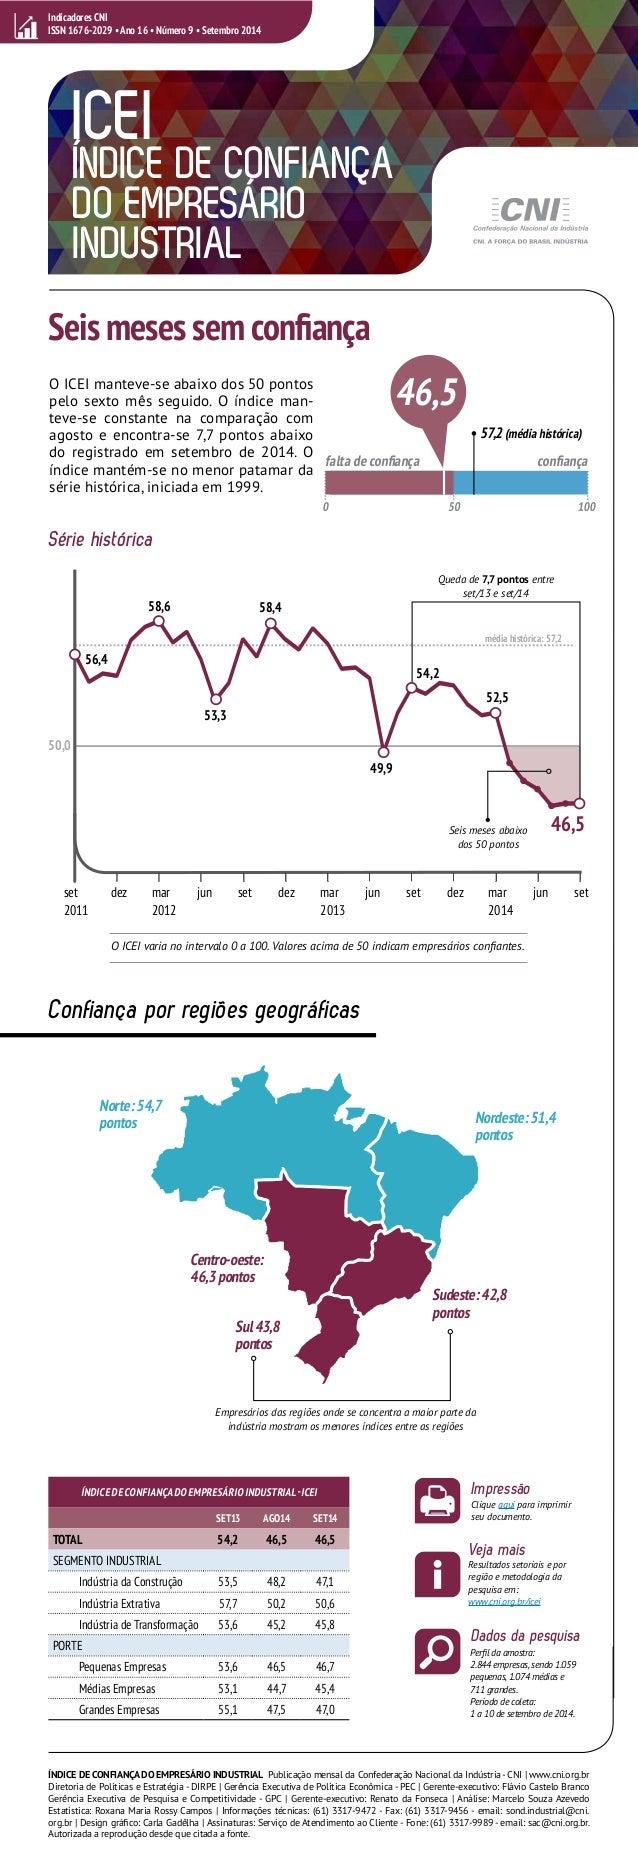 Indicadores CNI  ISSN 1676-2029 • Ano 16 • Número 9 • Setembro 2014  ICEI  ÍNDICE DE CONFIANÇA  DO EMPRESÁRIO  INDUSTRIAL ...